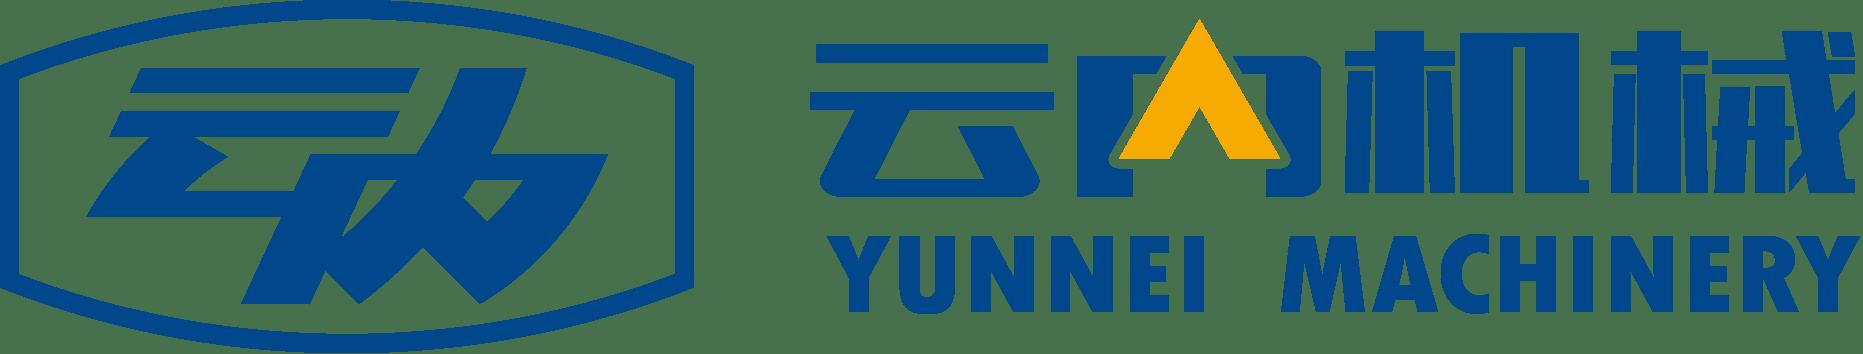 yabo亚博体育官网亚博体育app下载链接Logo